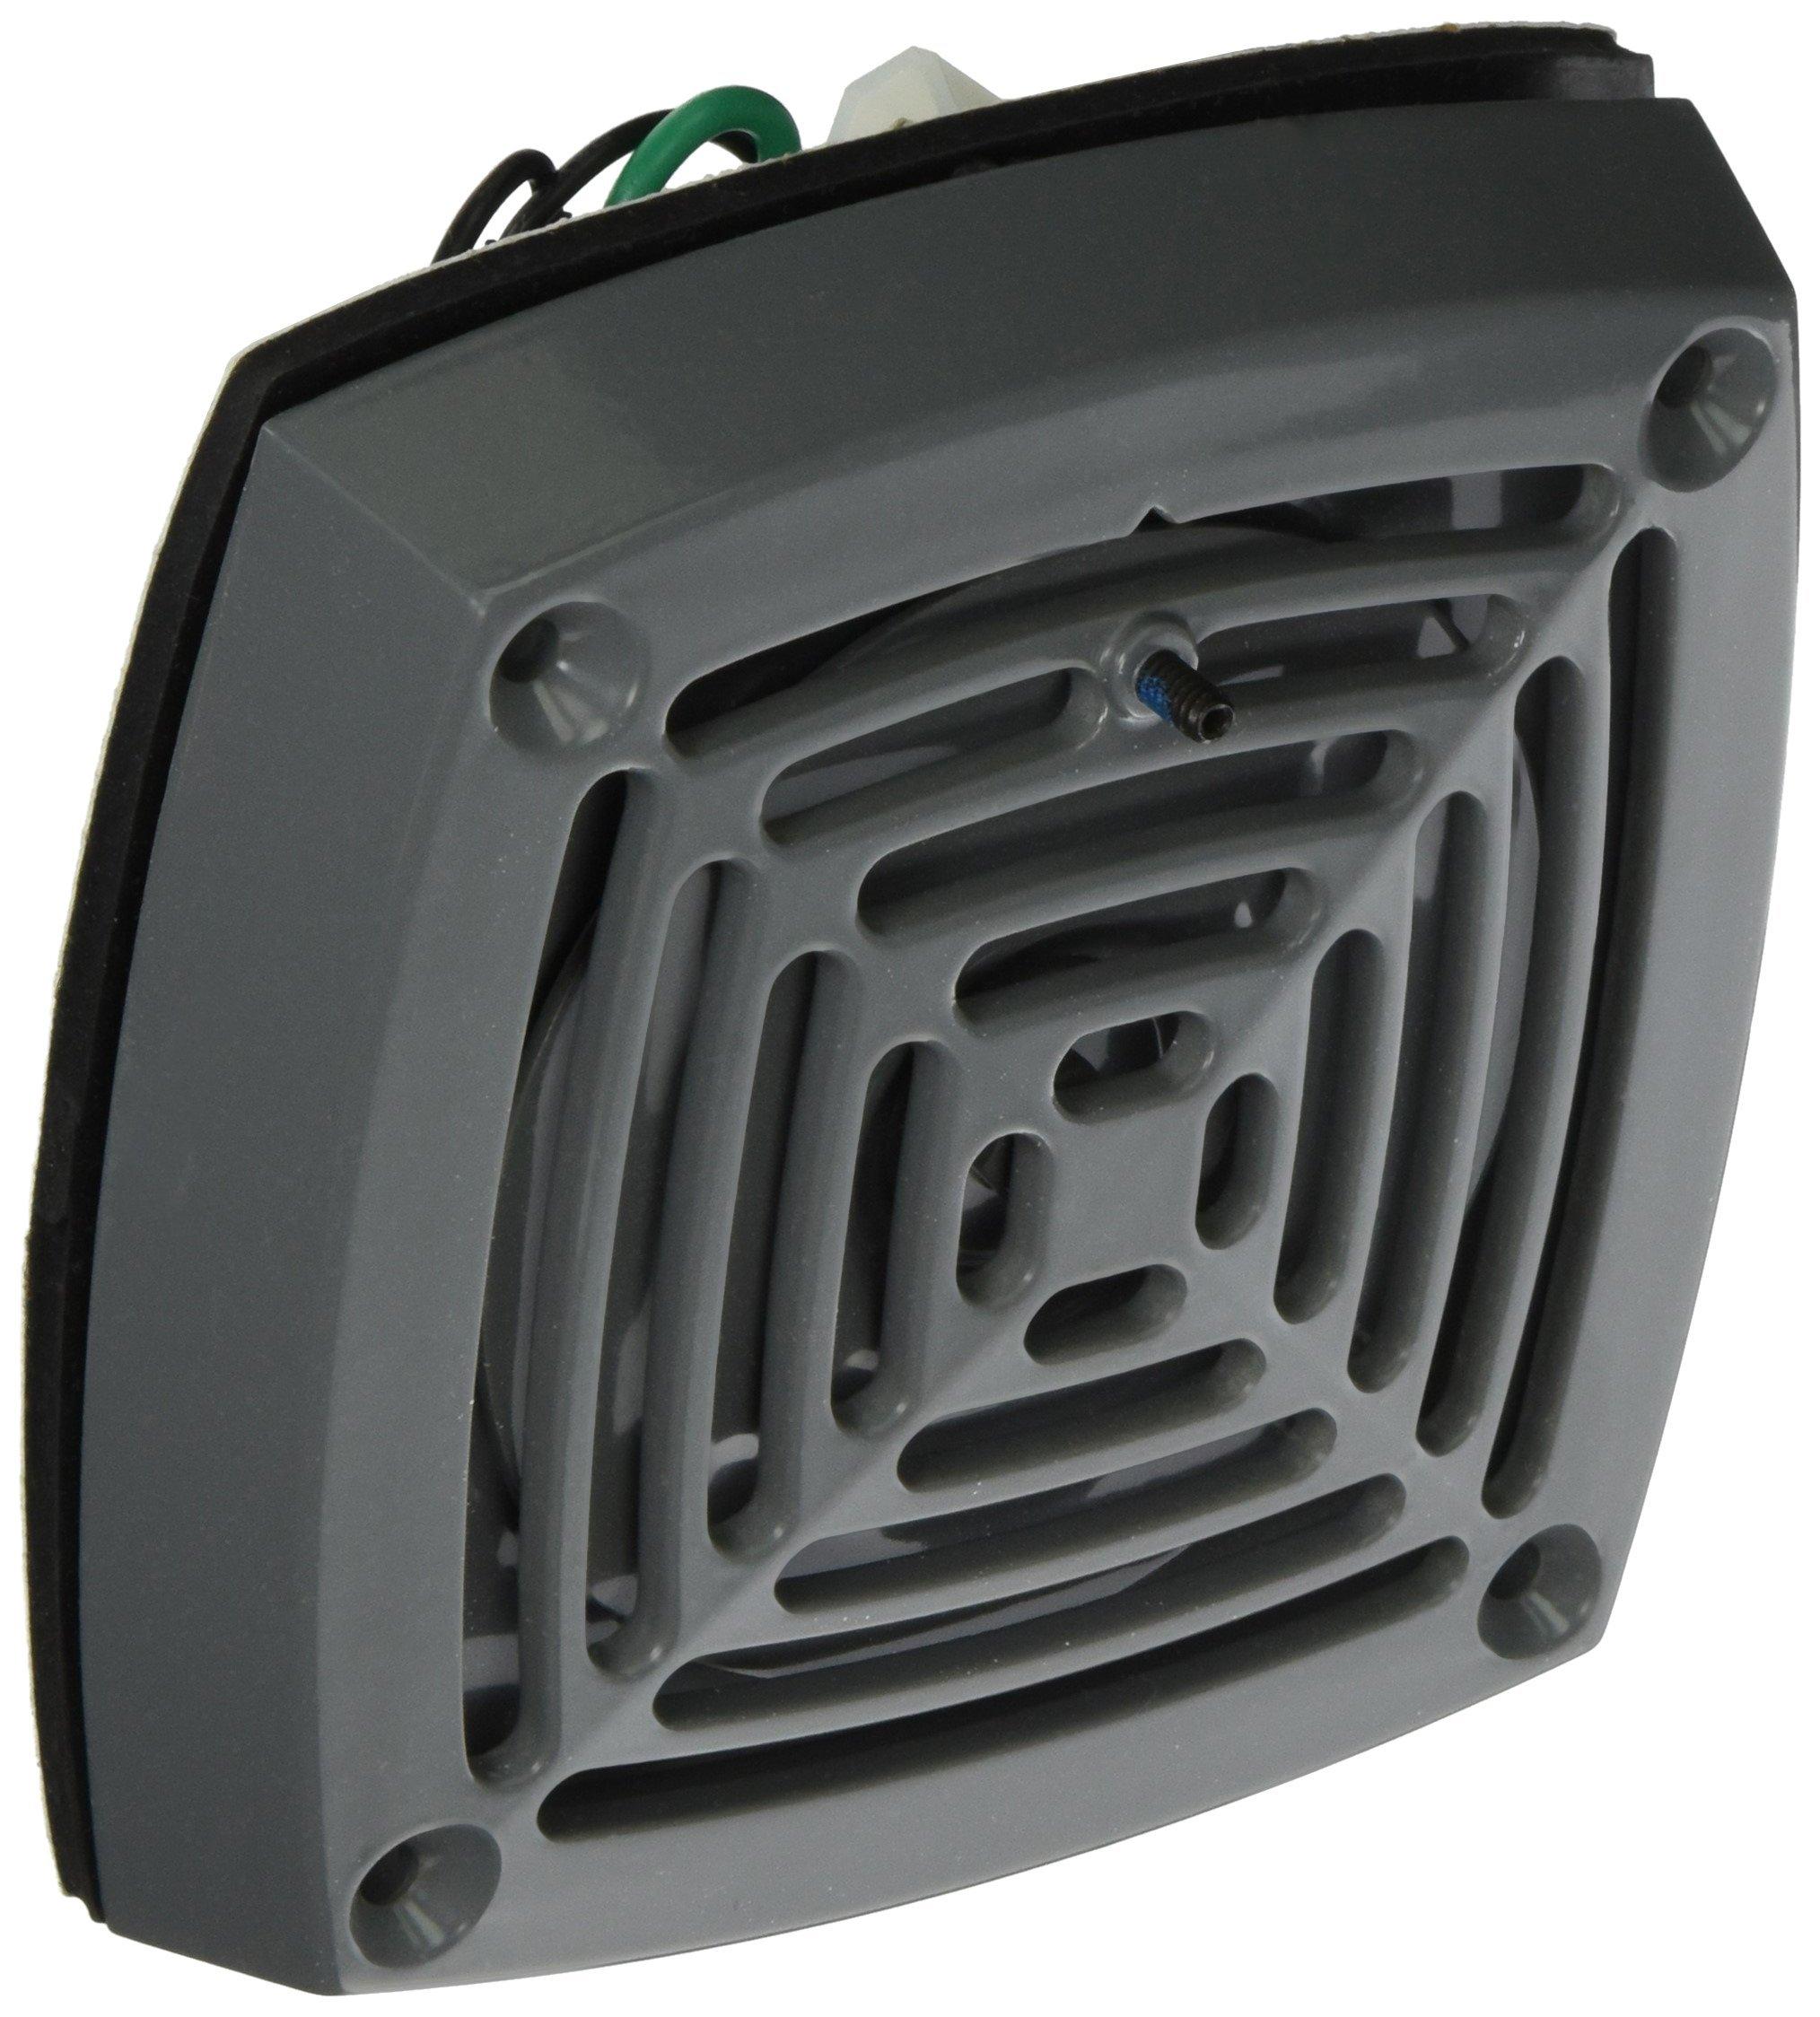 Edwards Signaling 870P-N5 Vibrating Horn, Heavy Duty, 113/103 db, Panel Mount, Volume Adjustable, 120V AC, Gray